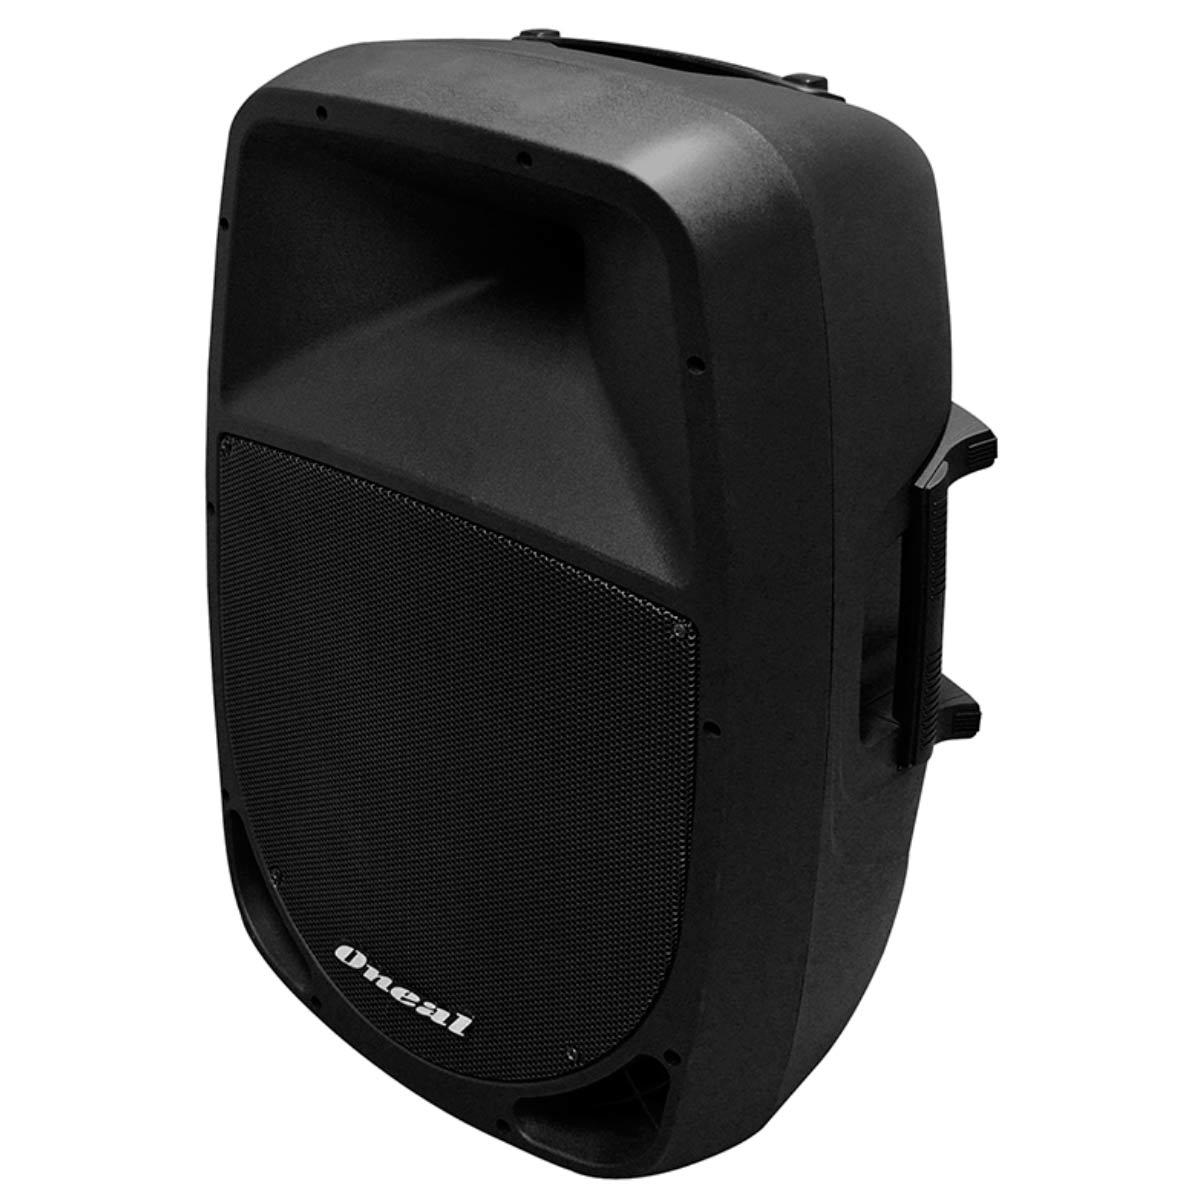 Caixa Ativa Fal 12 Pol 200W c/ USB / Bluetooth - OPB 1112BT Oneal